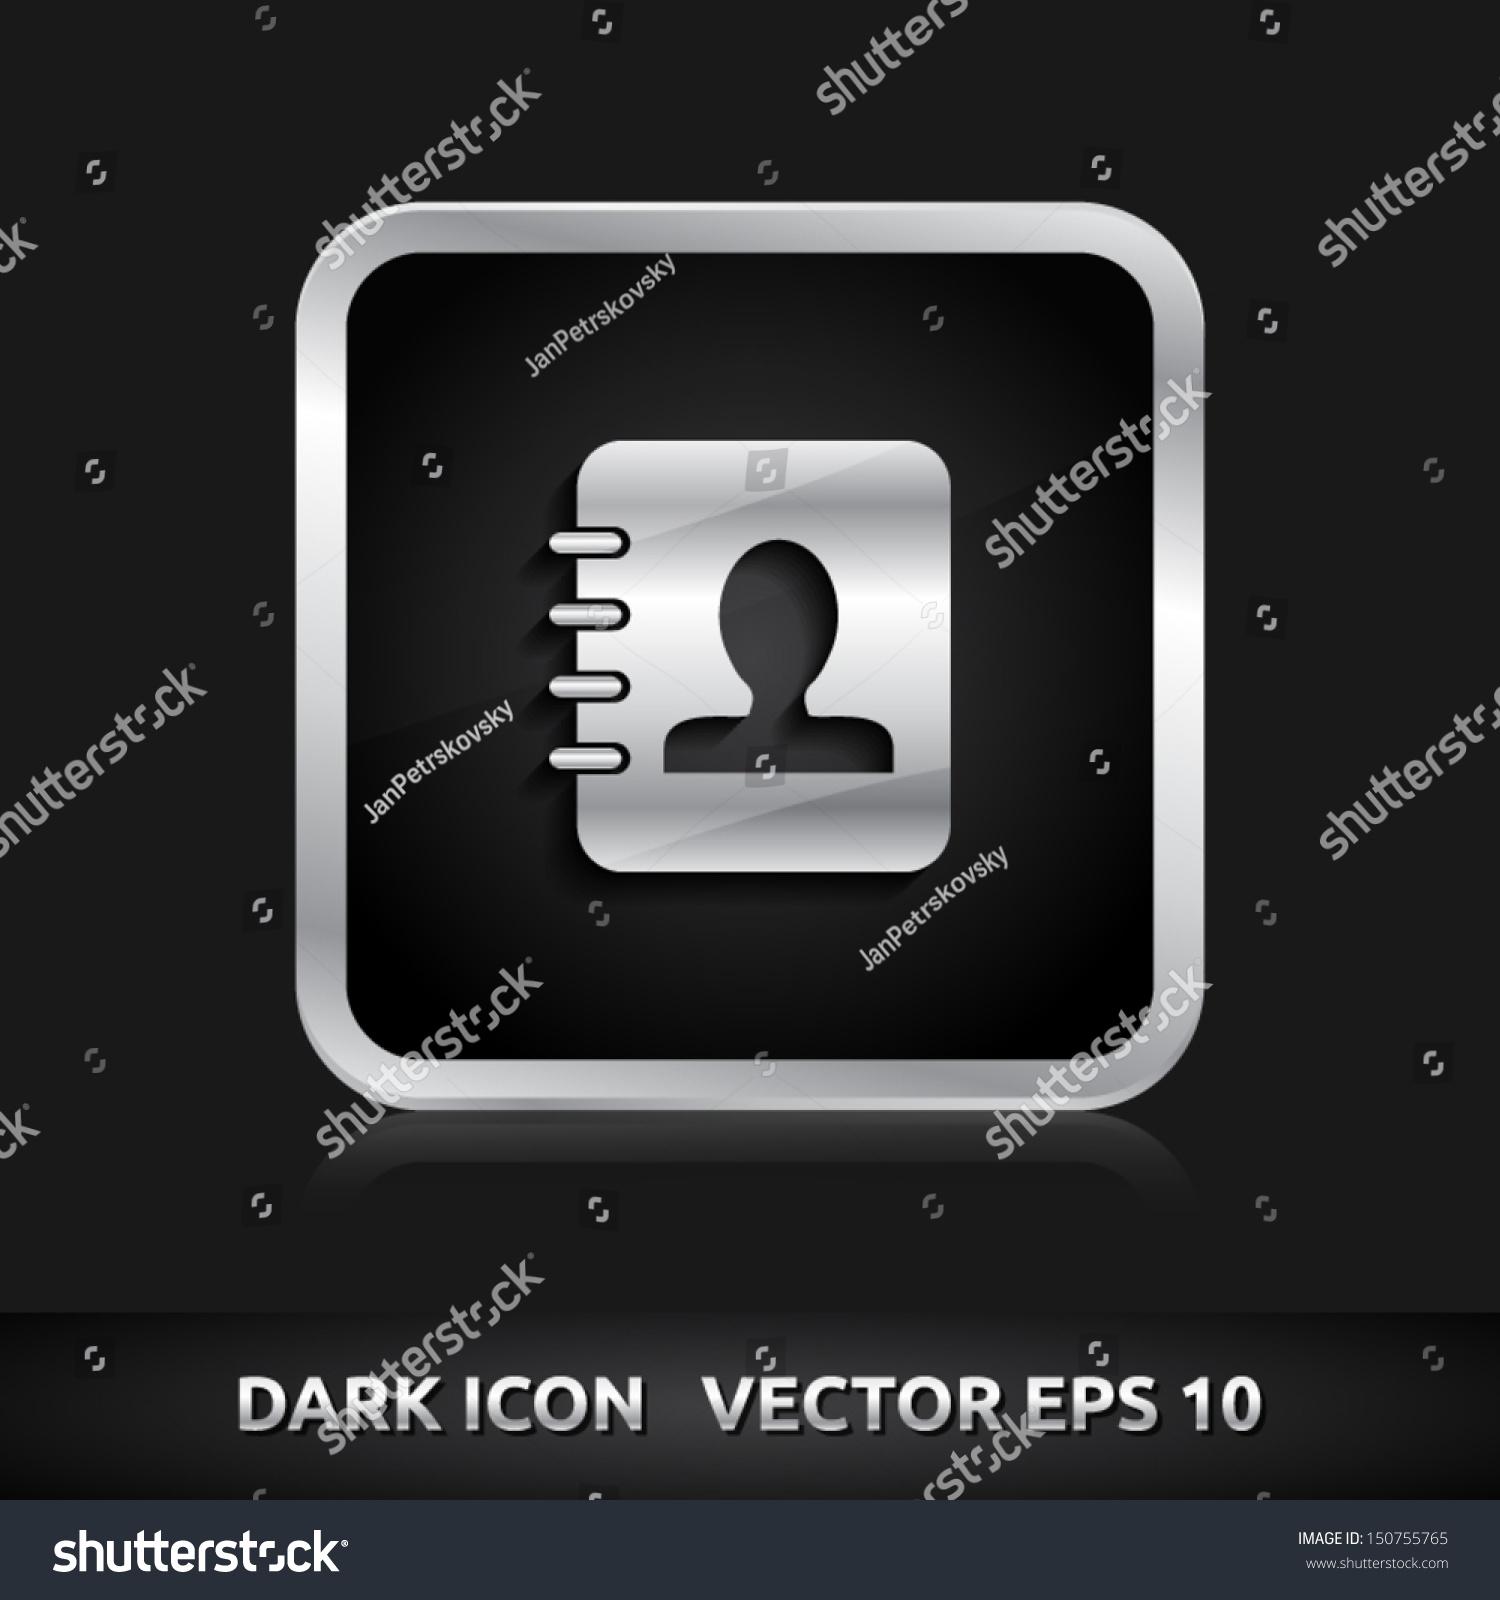 abstract black dark digital art 3d 2560x1440 wallpaper High ...